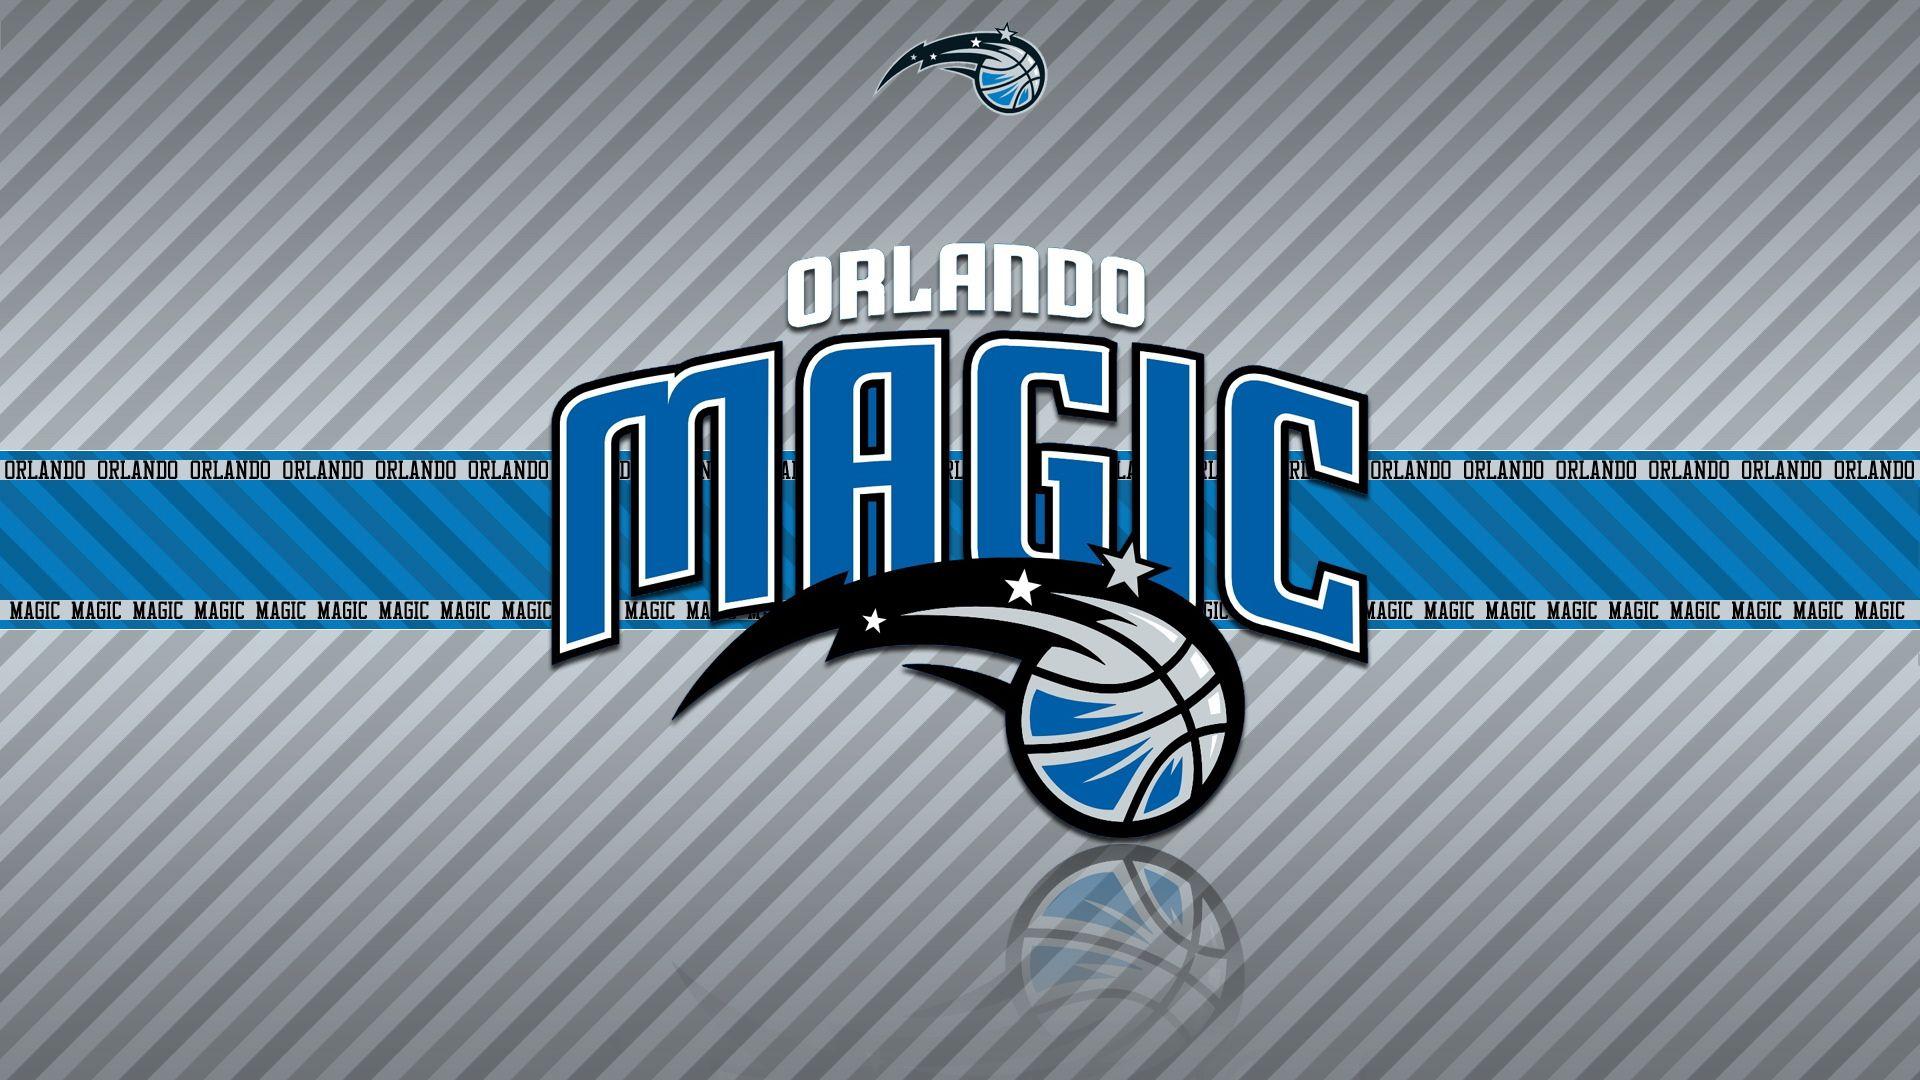 Orlando Magic Wallpapers HD 1920x1080